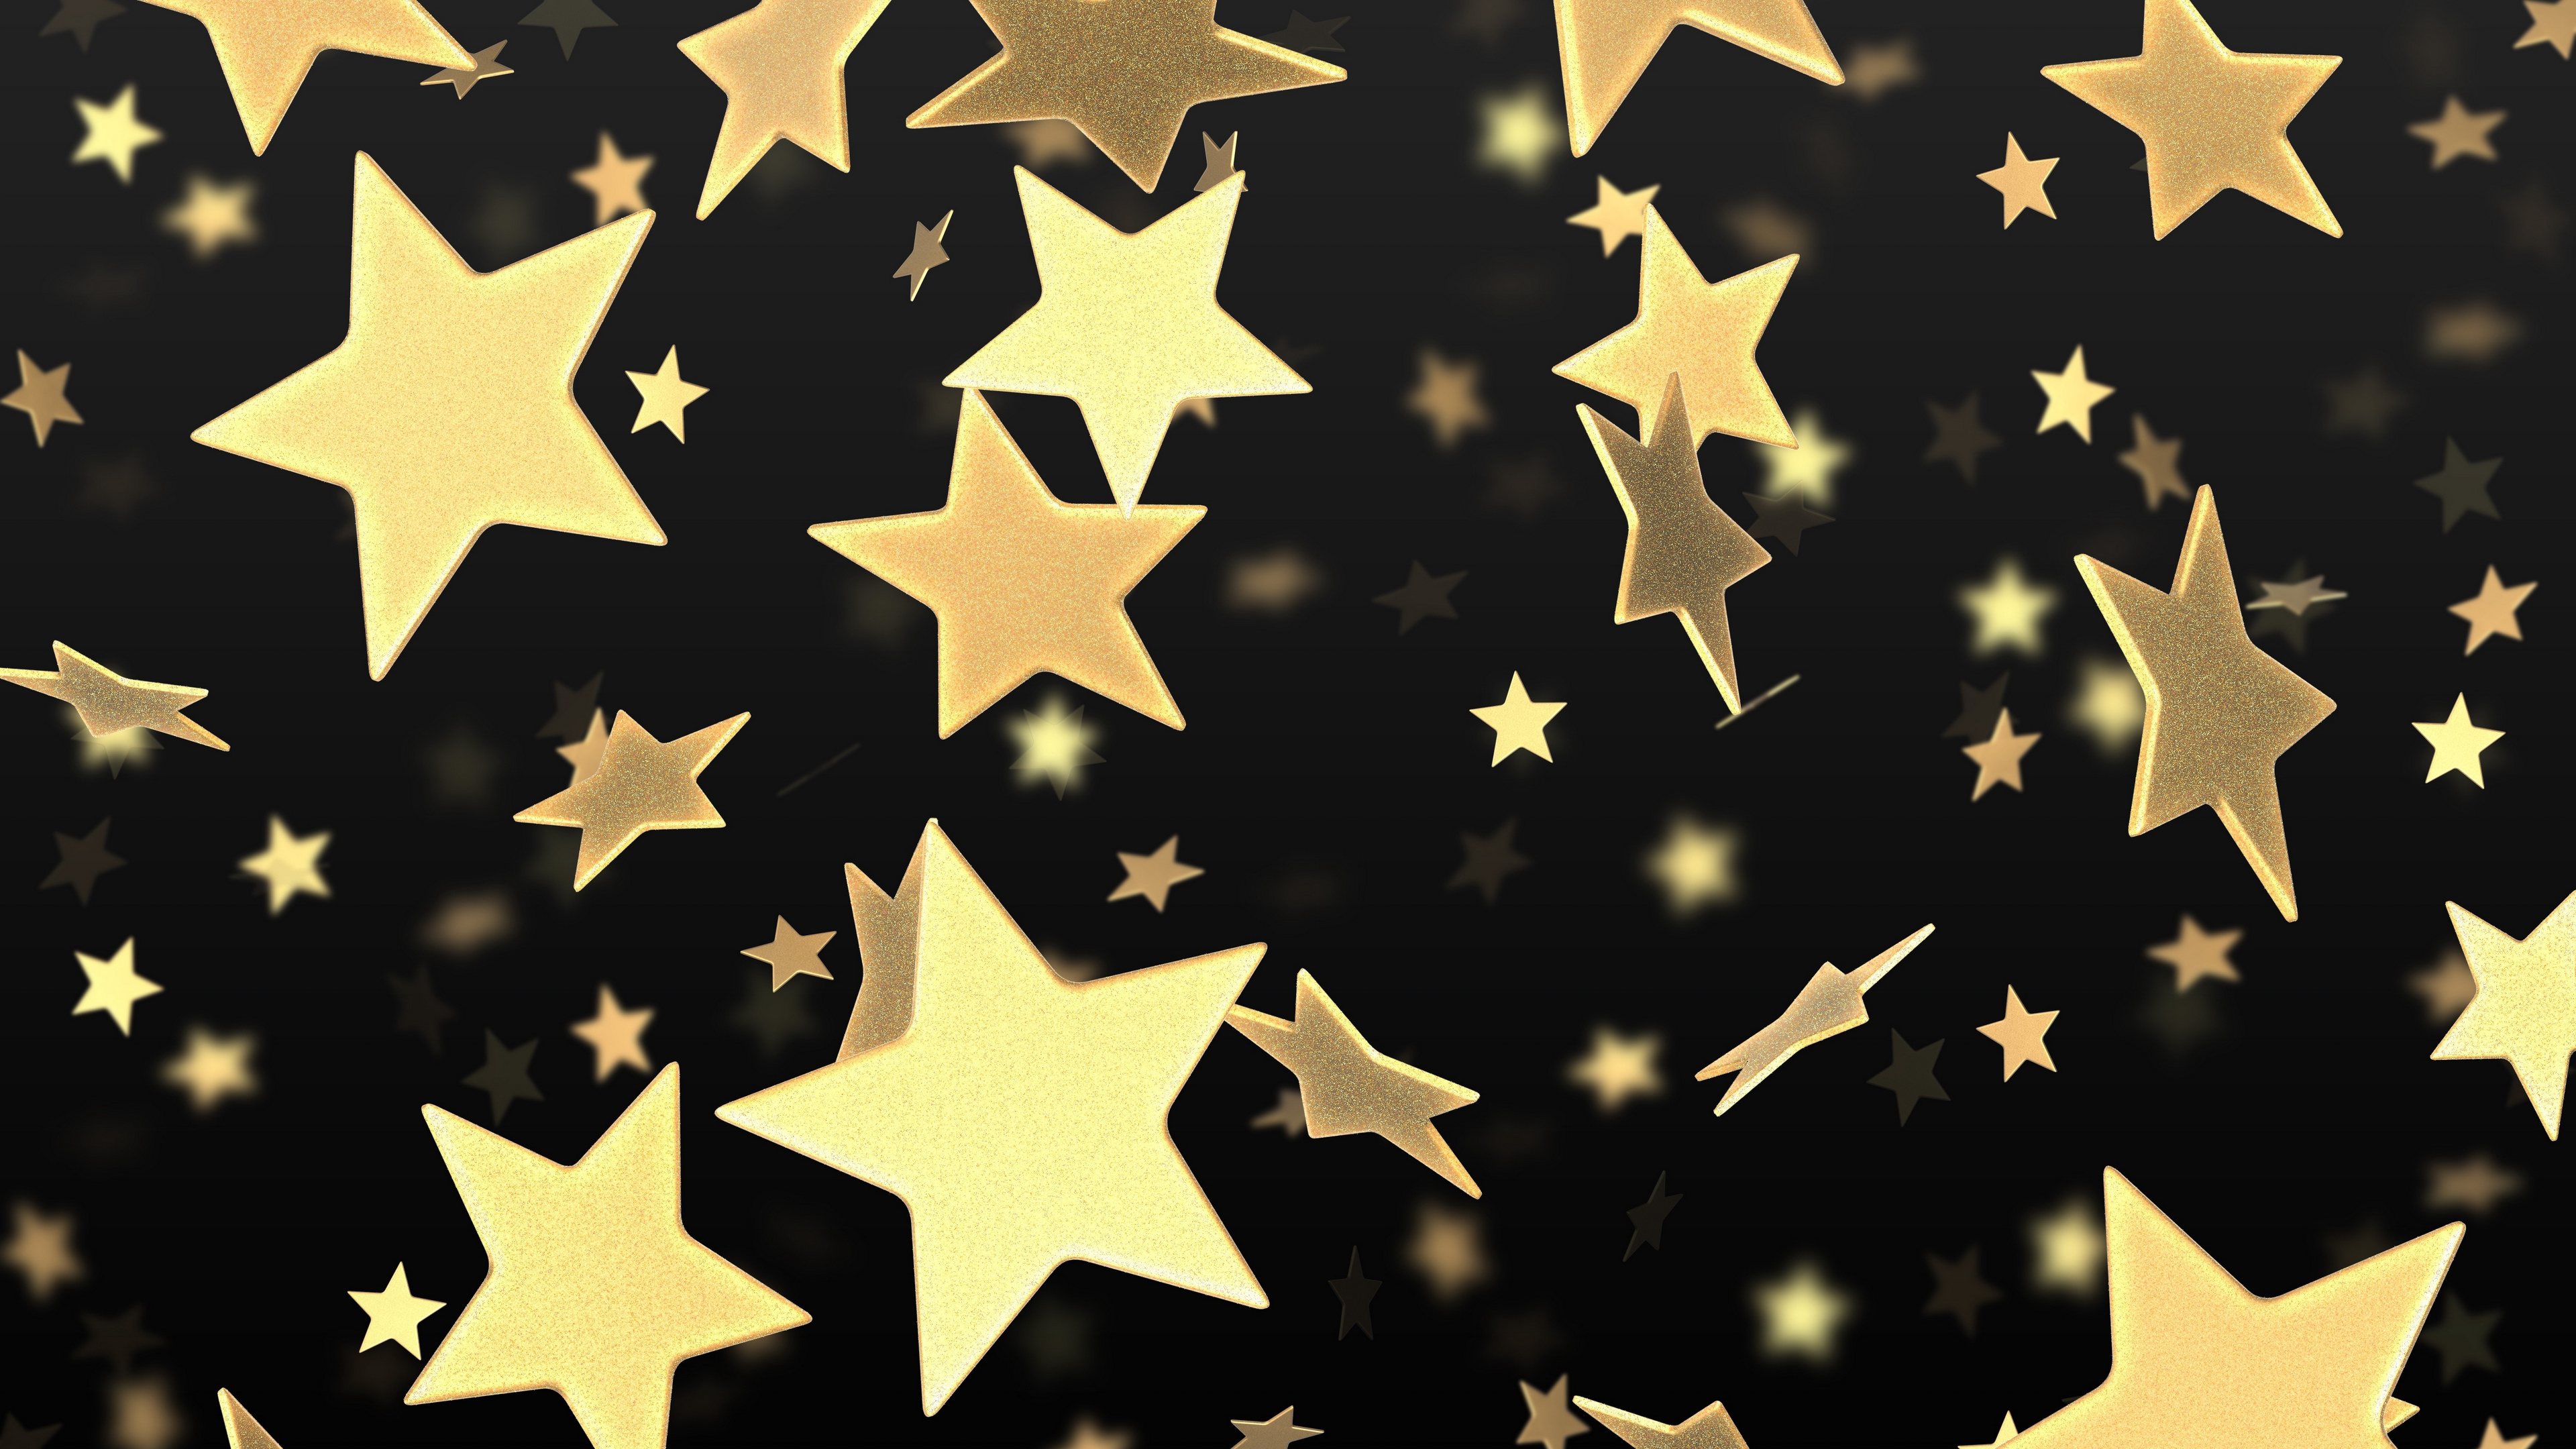 star flying gold 4k 1536097853 - star, flying, gold 4k - Star, Gold, Flying